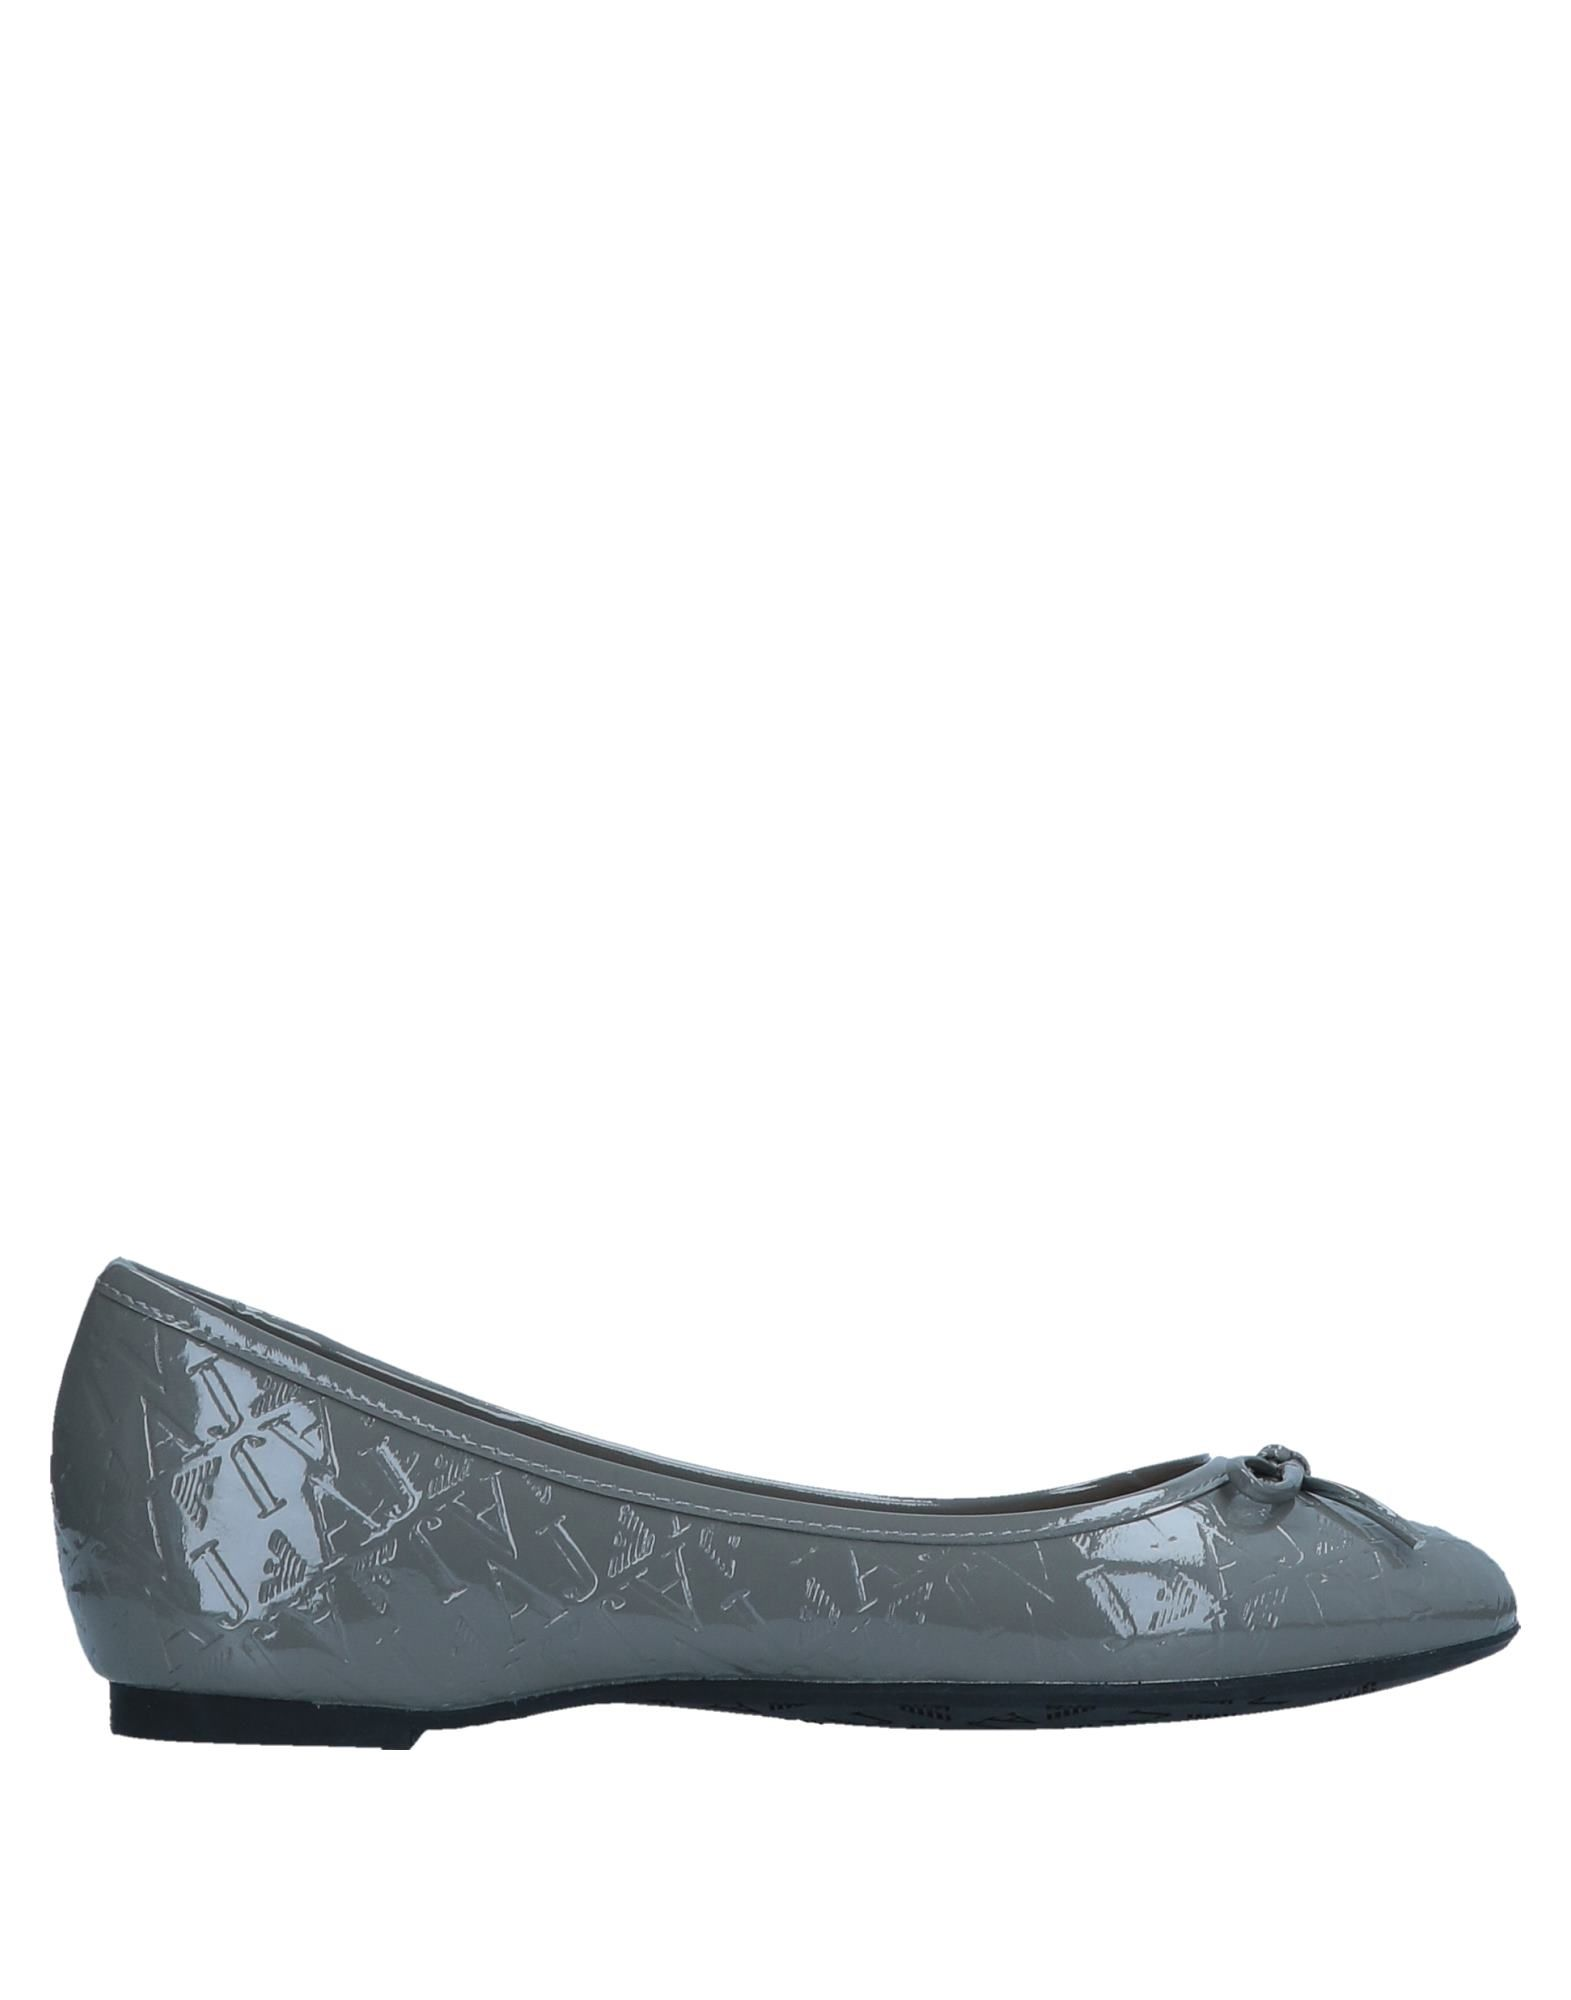 Armani Jeans Ballet Flats - Flats Women Armani Jeans Ballet Flats - online on  Australia - 11548740WI 502b46